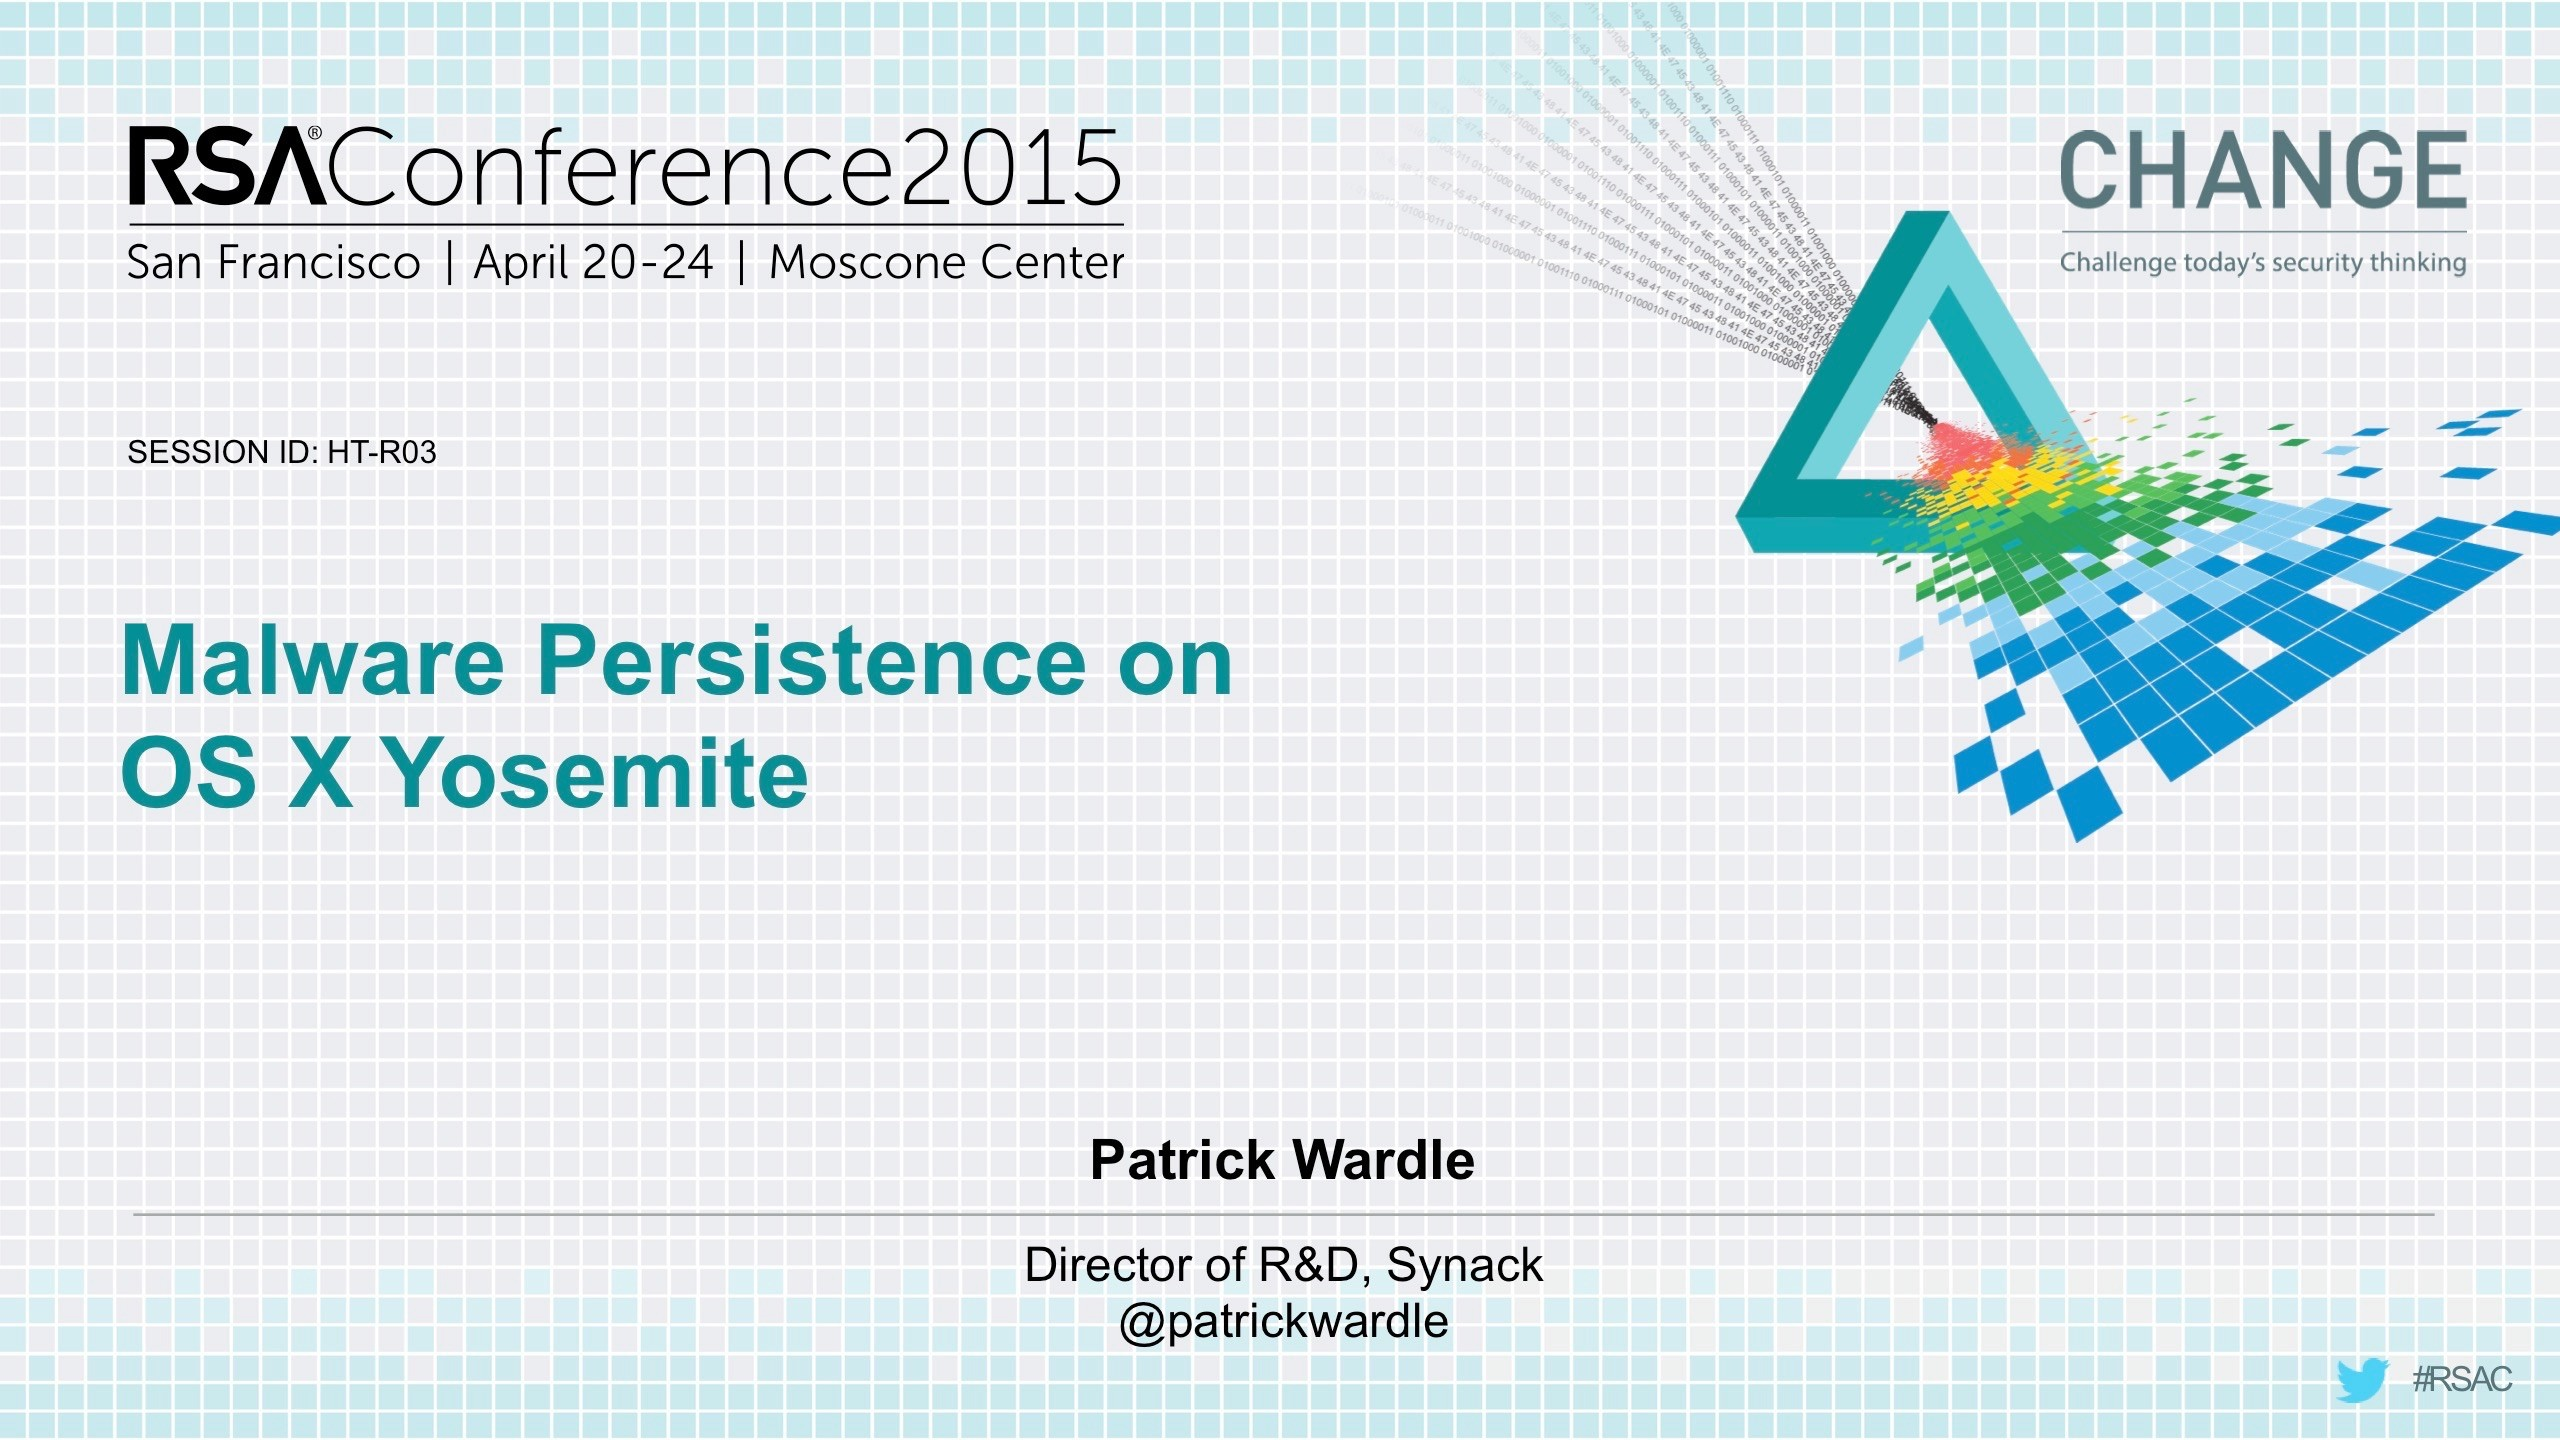 Malware-Persistence-on-OS-X-Yosemite